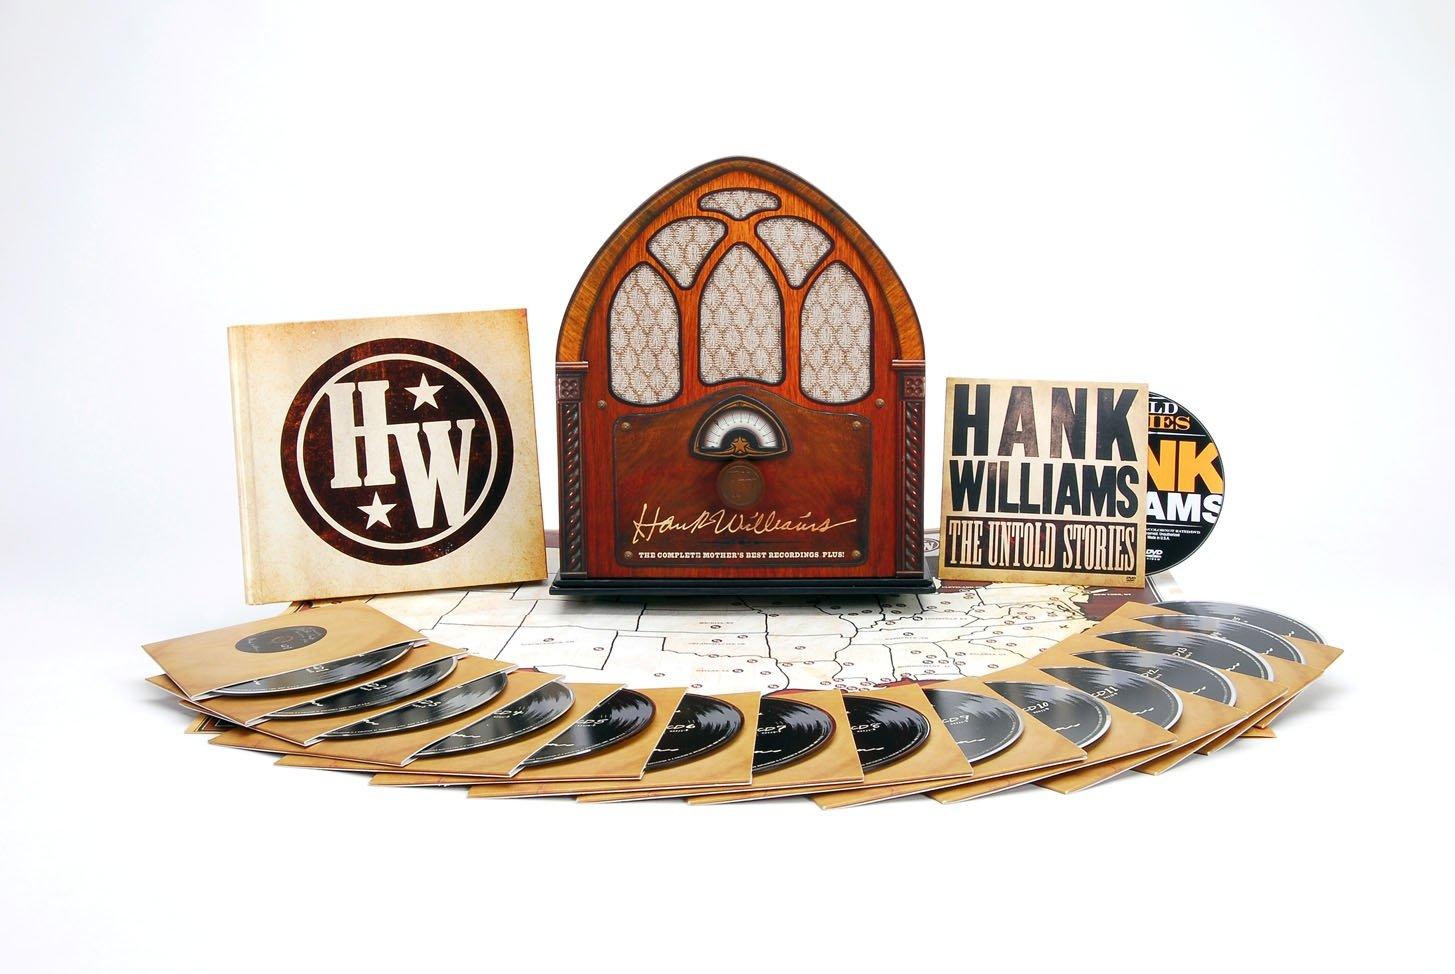 Hank Williams the Complete Mother's Best